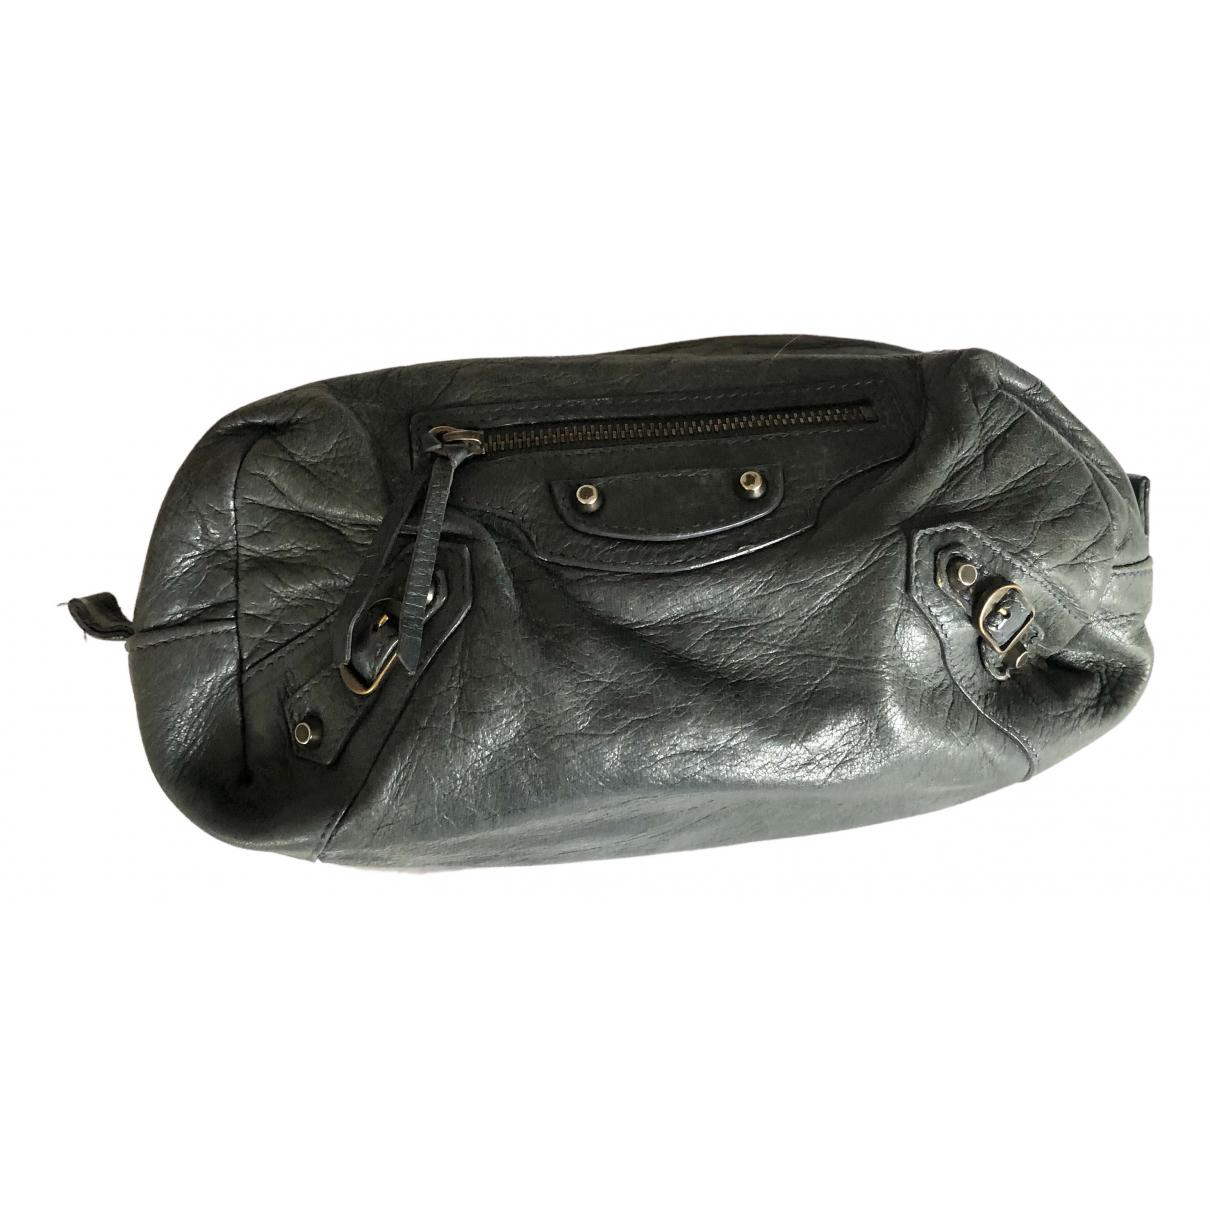 Balenciaga - Sac de voyage   pour femme en cuir - gris